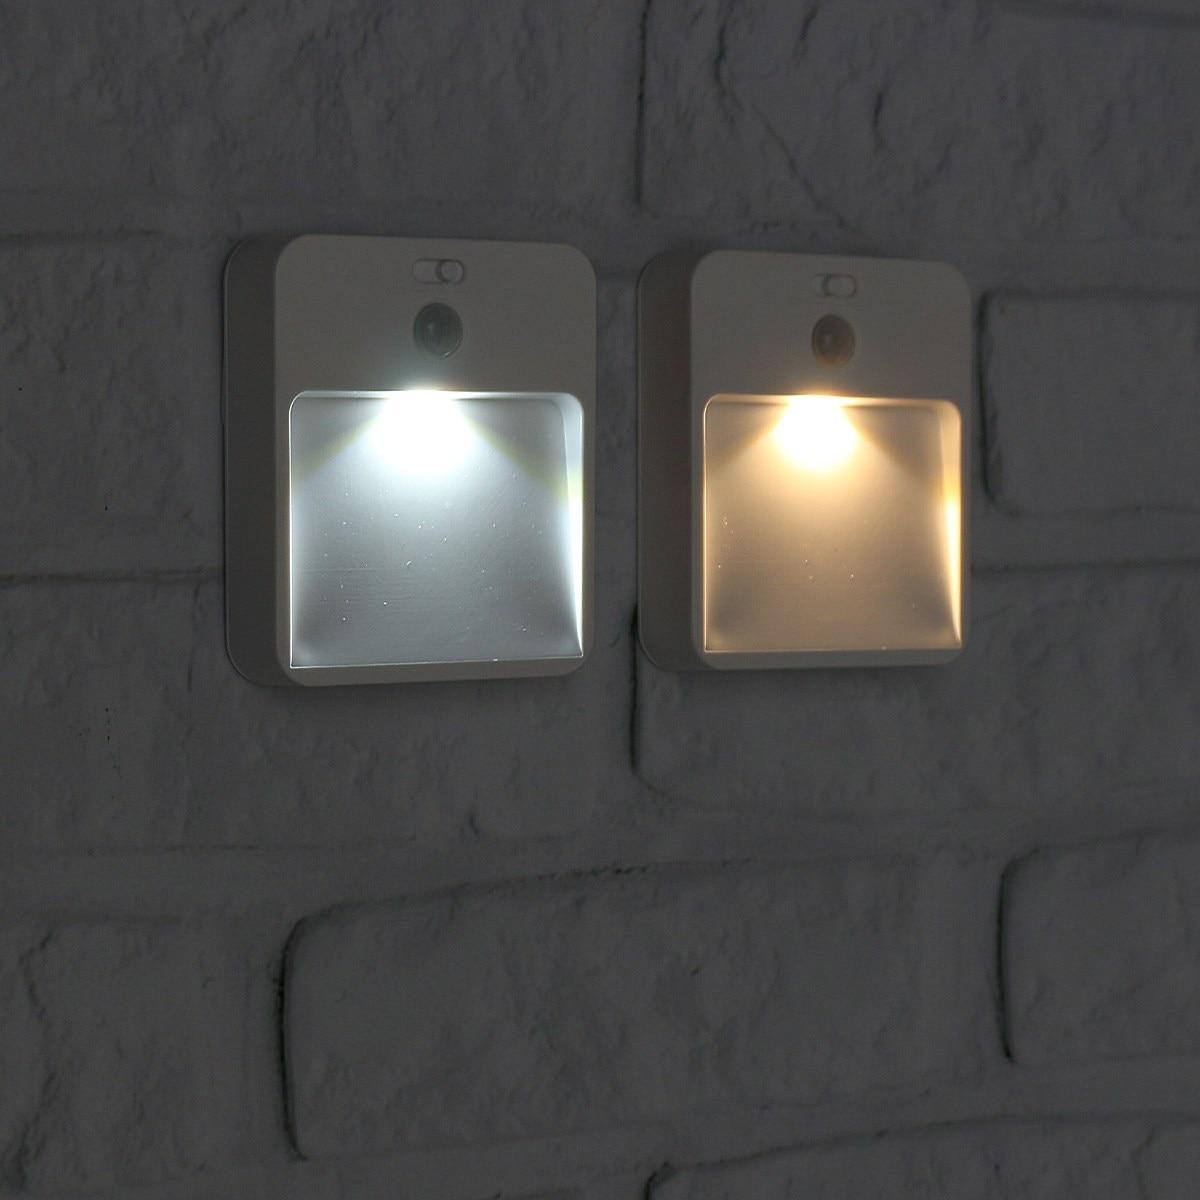 Warm White Lighting Solar Power Charging LED Infrared Body Motion Sensor Night Light Corridor Hallway Wall Mounted Lamp 1x led night light lamps motion sensor nightlight pir intelligent led human body motion induction lamp energy saving lighting